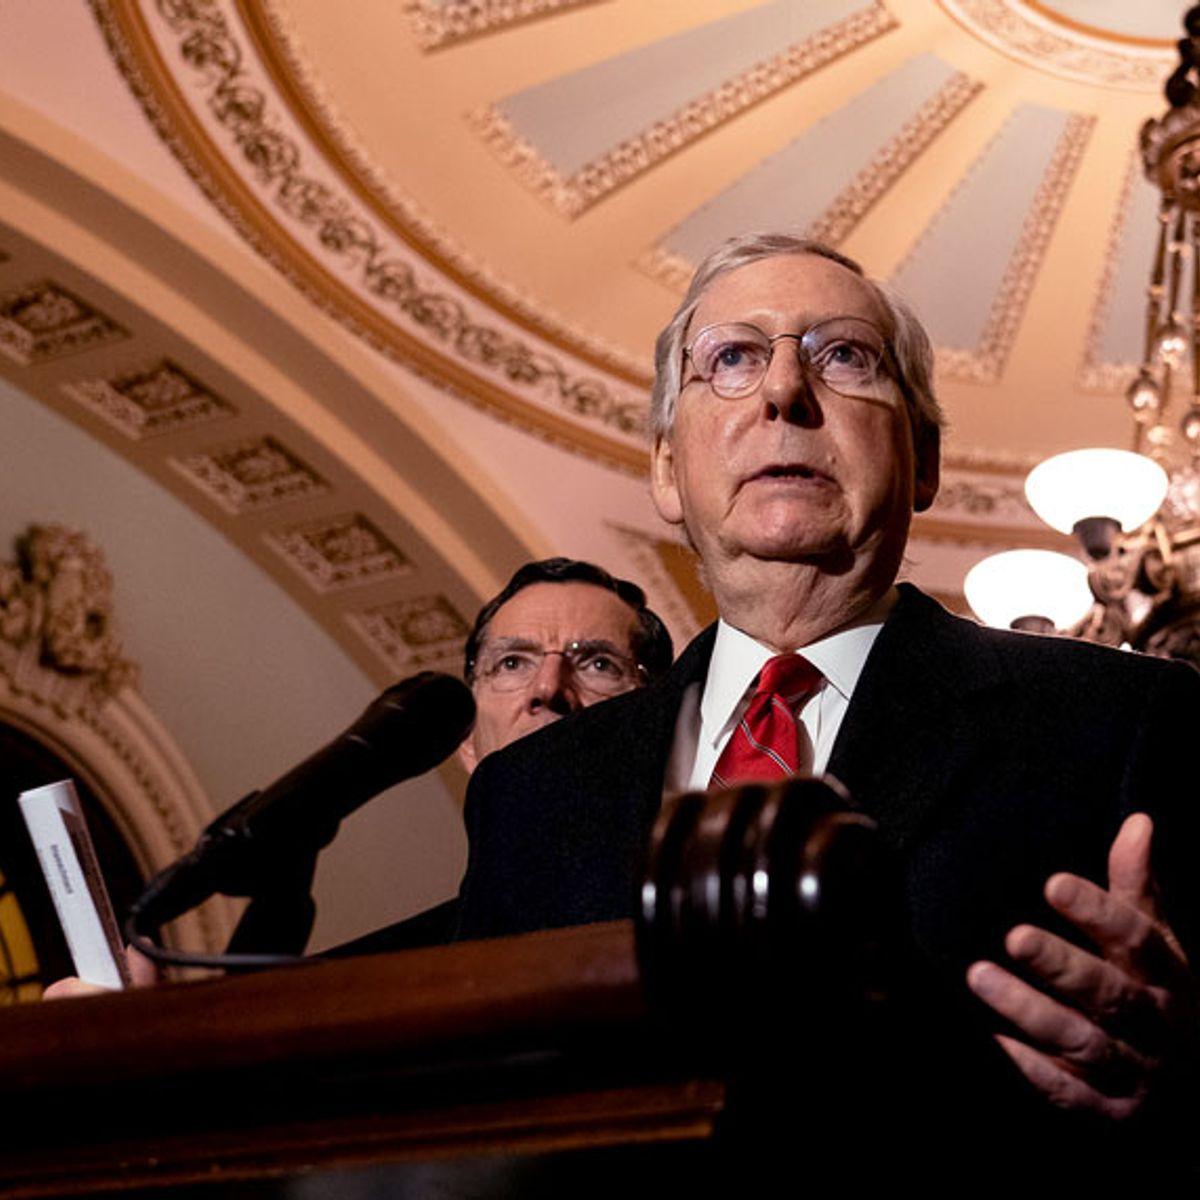 Republicans admit it: Senate impeachment trial of Trump will be a total sham